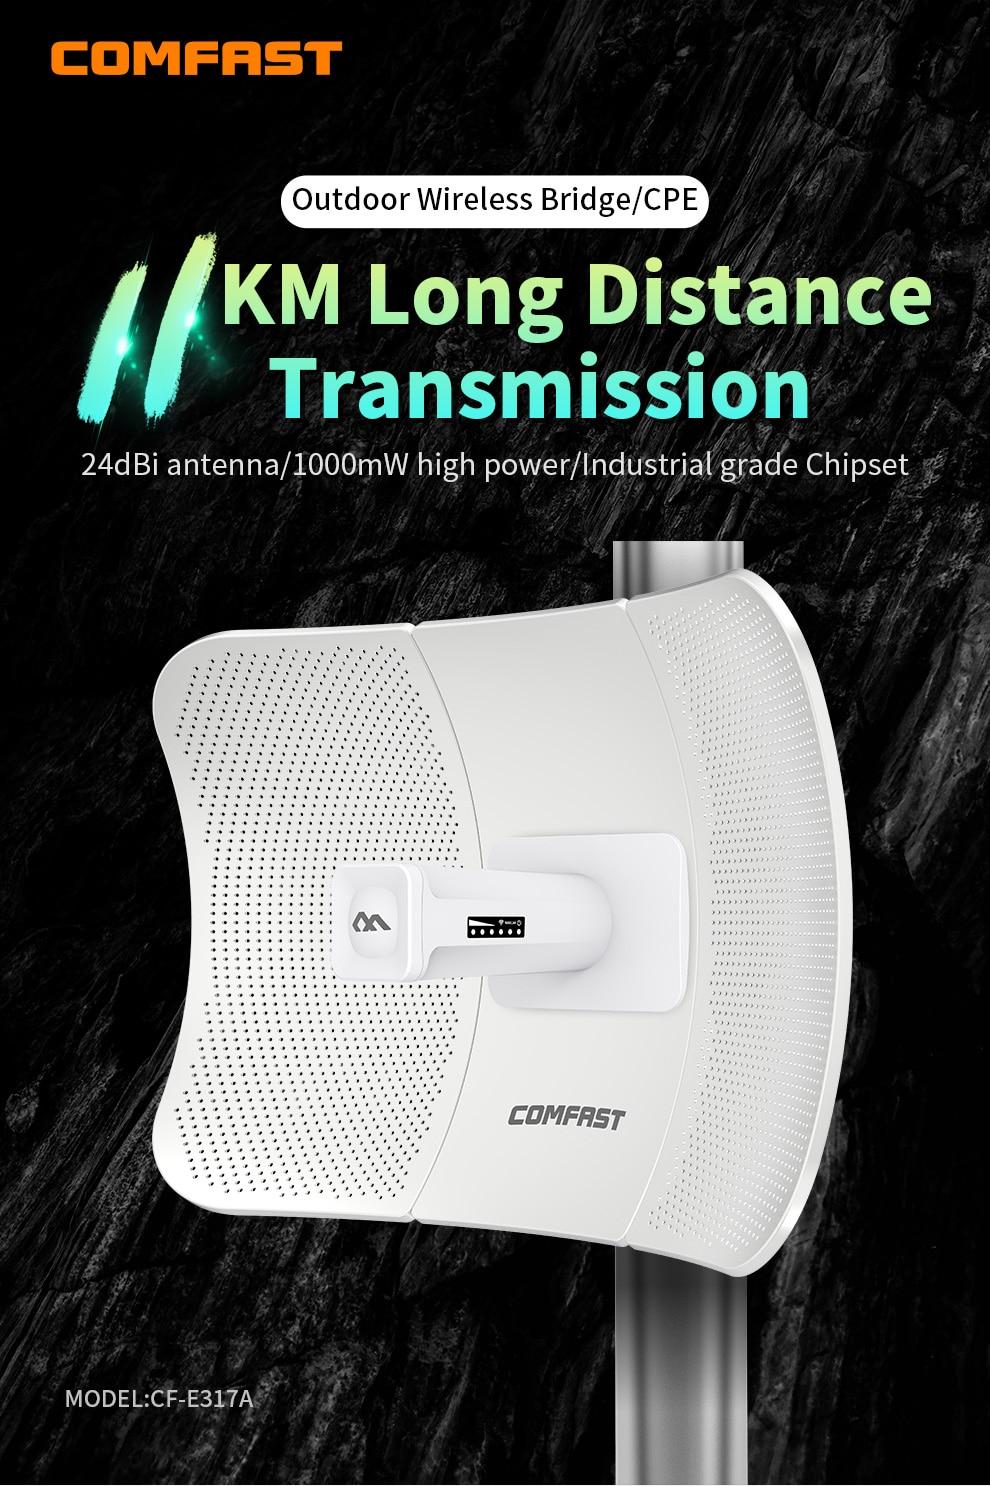 3-11KM 5Ghz Outdoor Wireless AP Bridge WIFI CPE Access Point Long Distance WI-FI Signal Amplifer Antenna Nanostation Extender enlarge